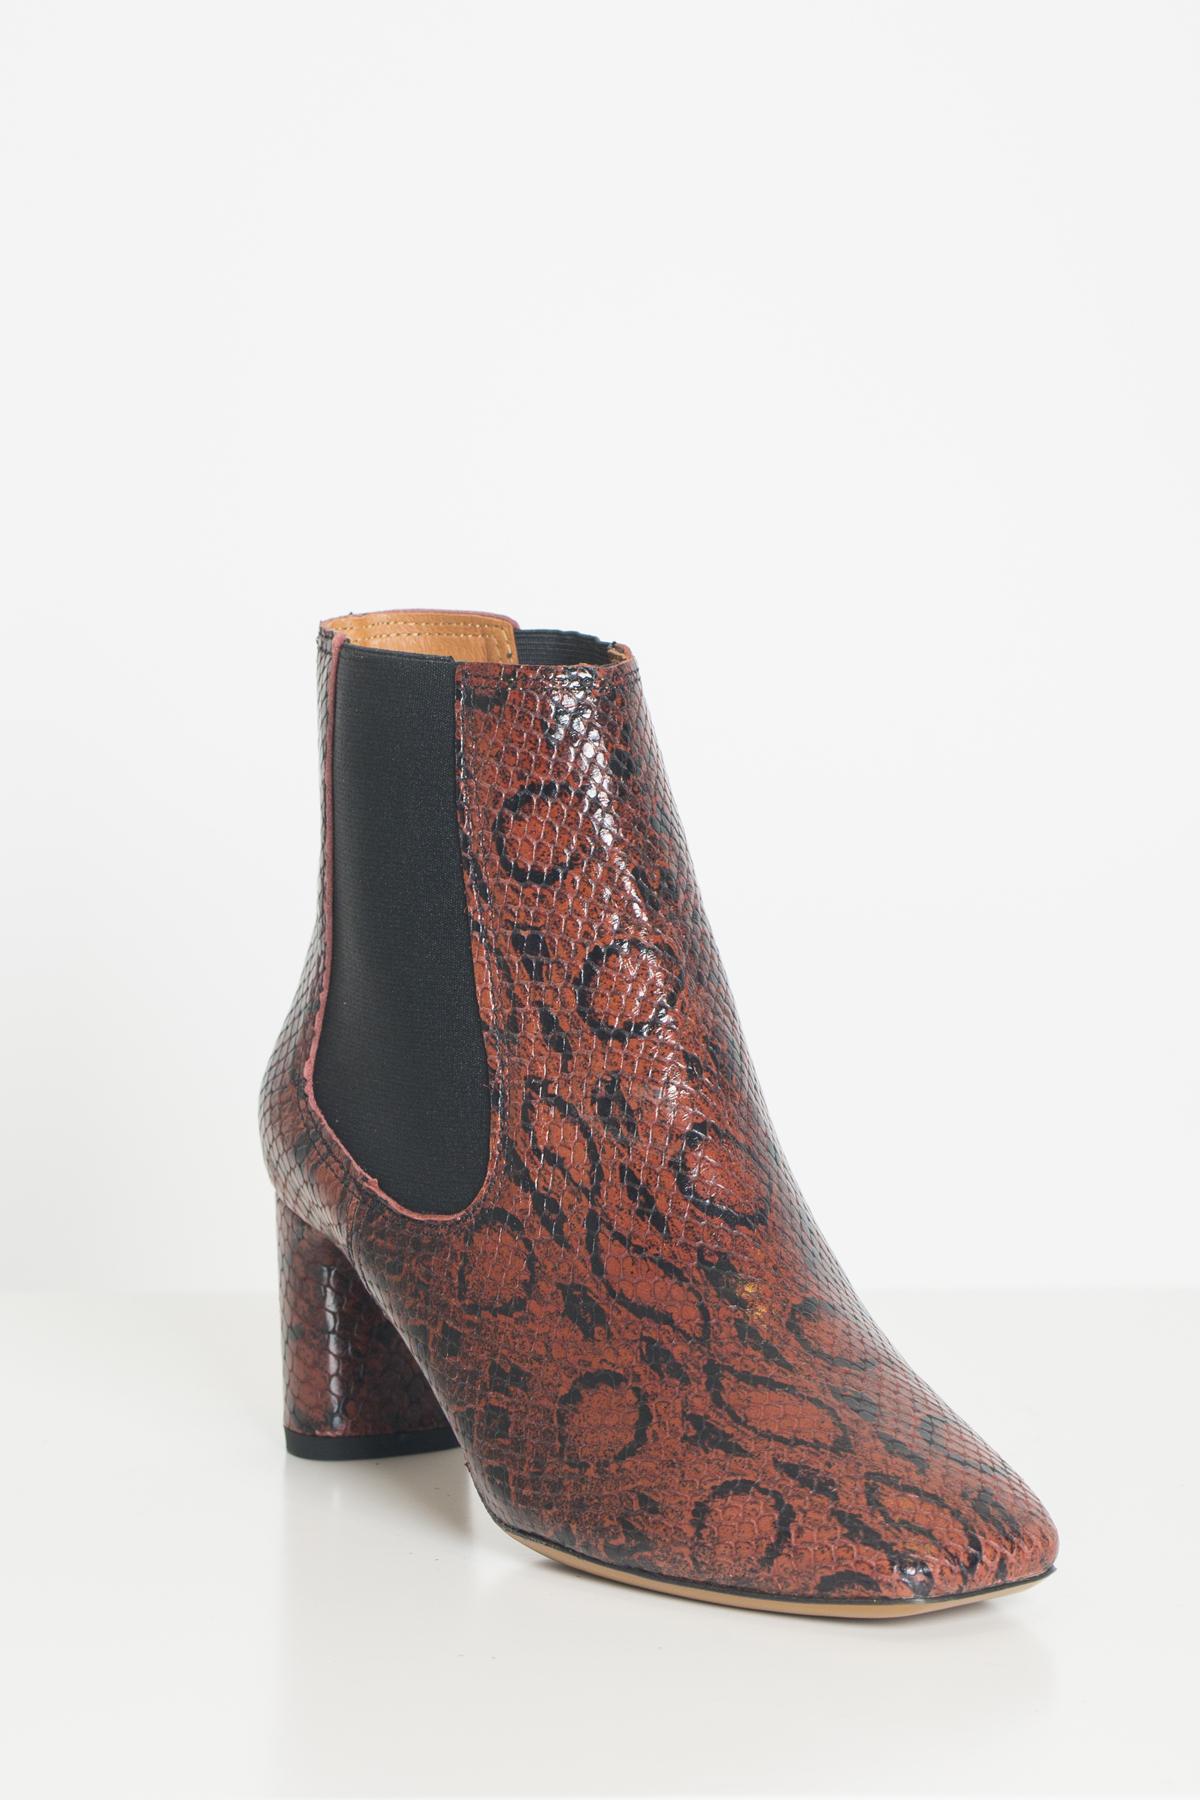 dreami-snake-chestnut-leather-booties-anonymous-copenhagen-matchboxathens